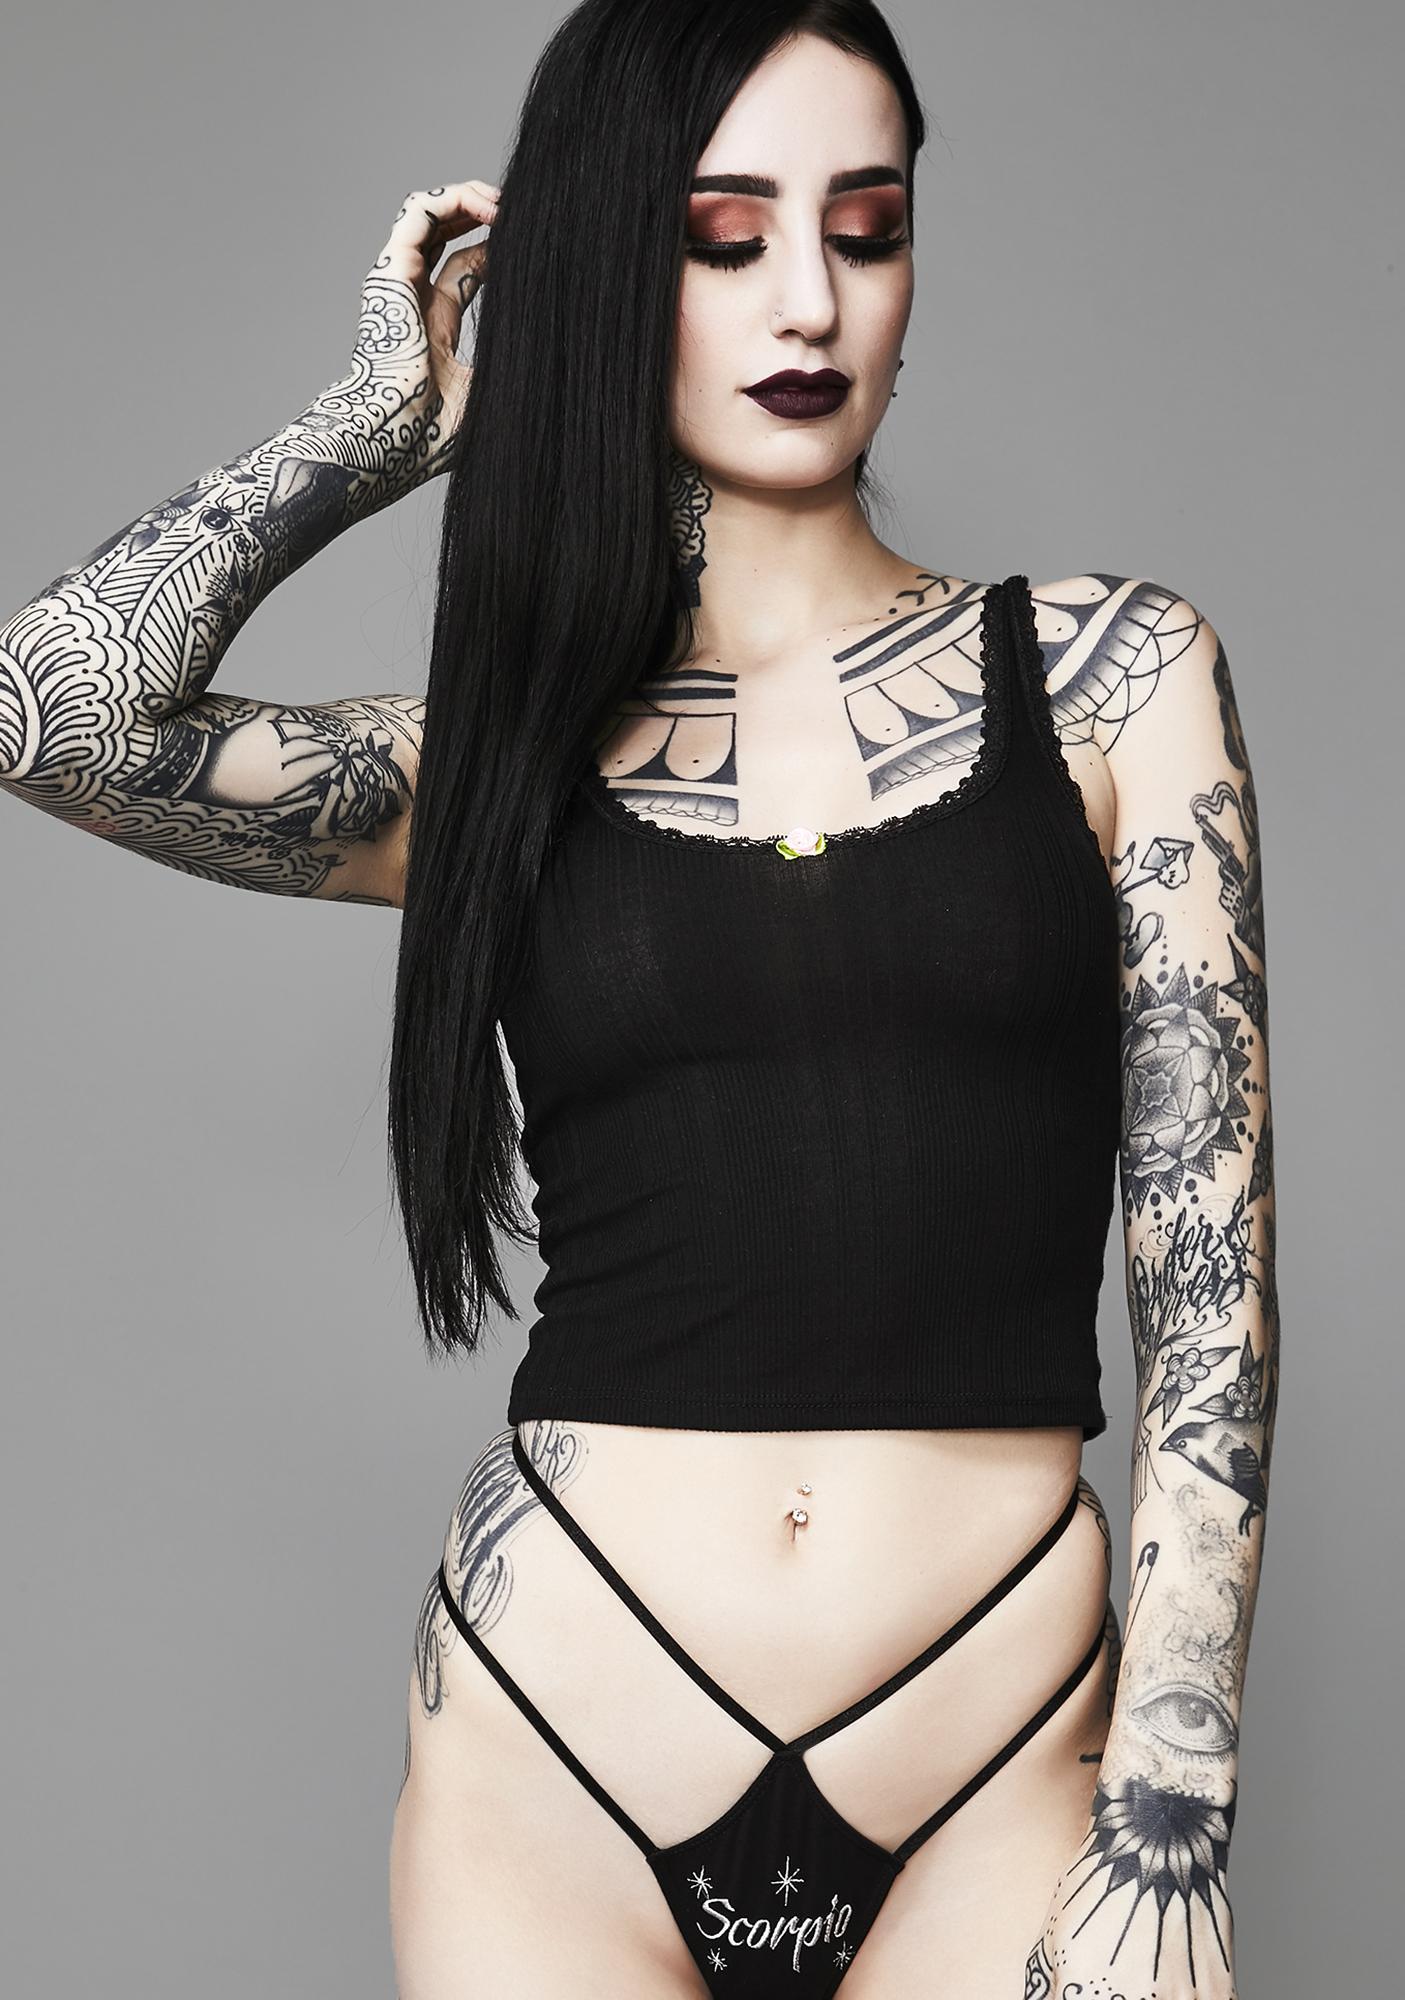 Widow Dark Side Of Scorpio Panty